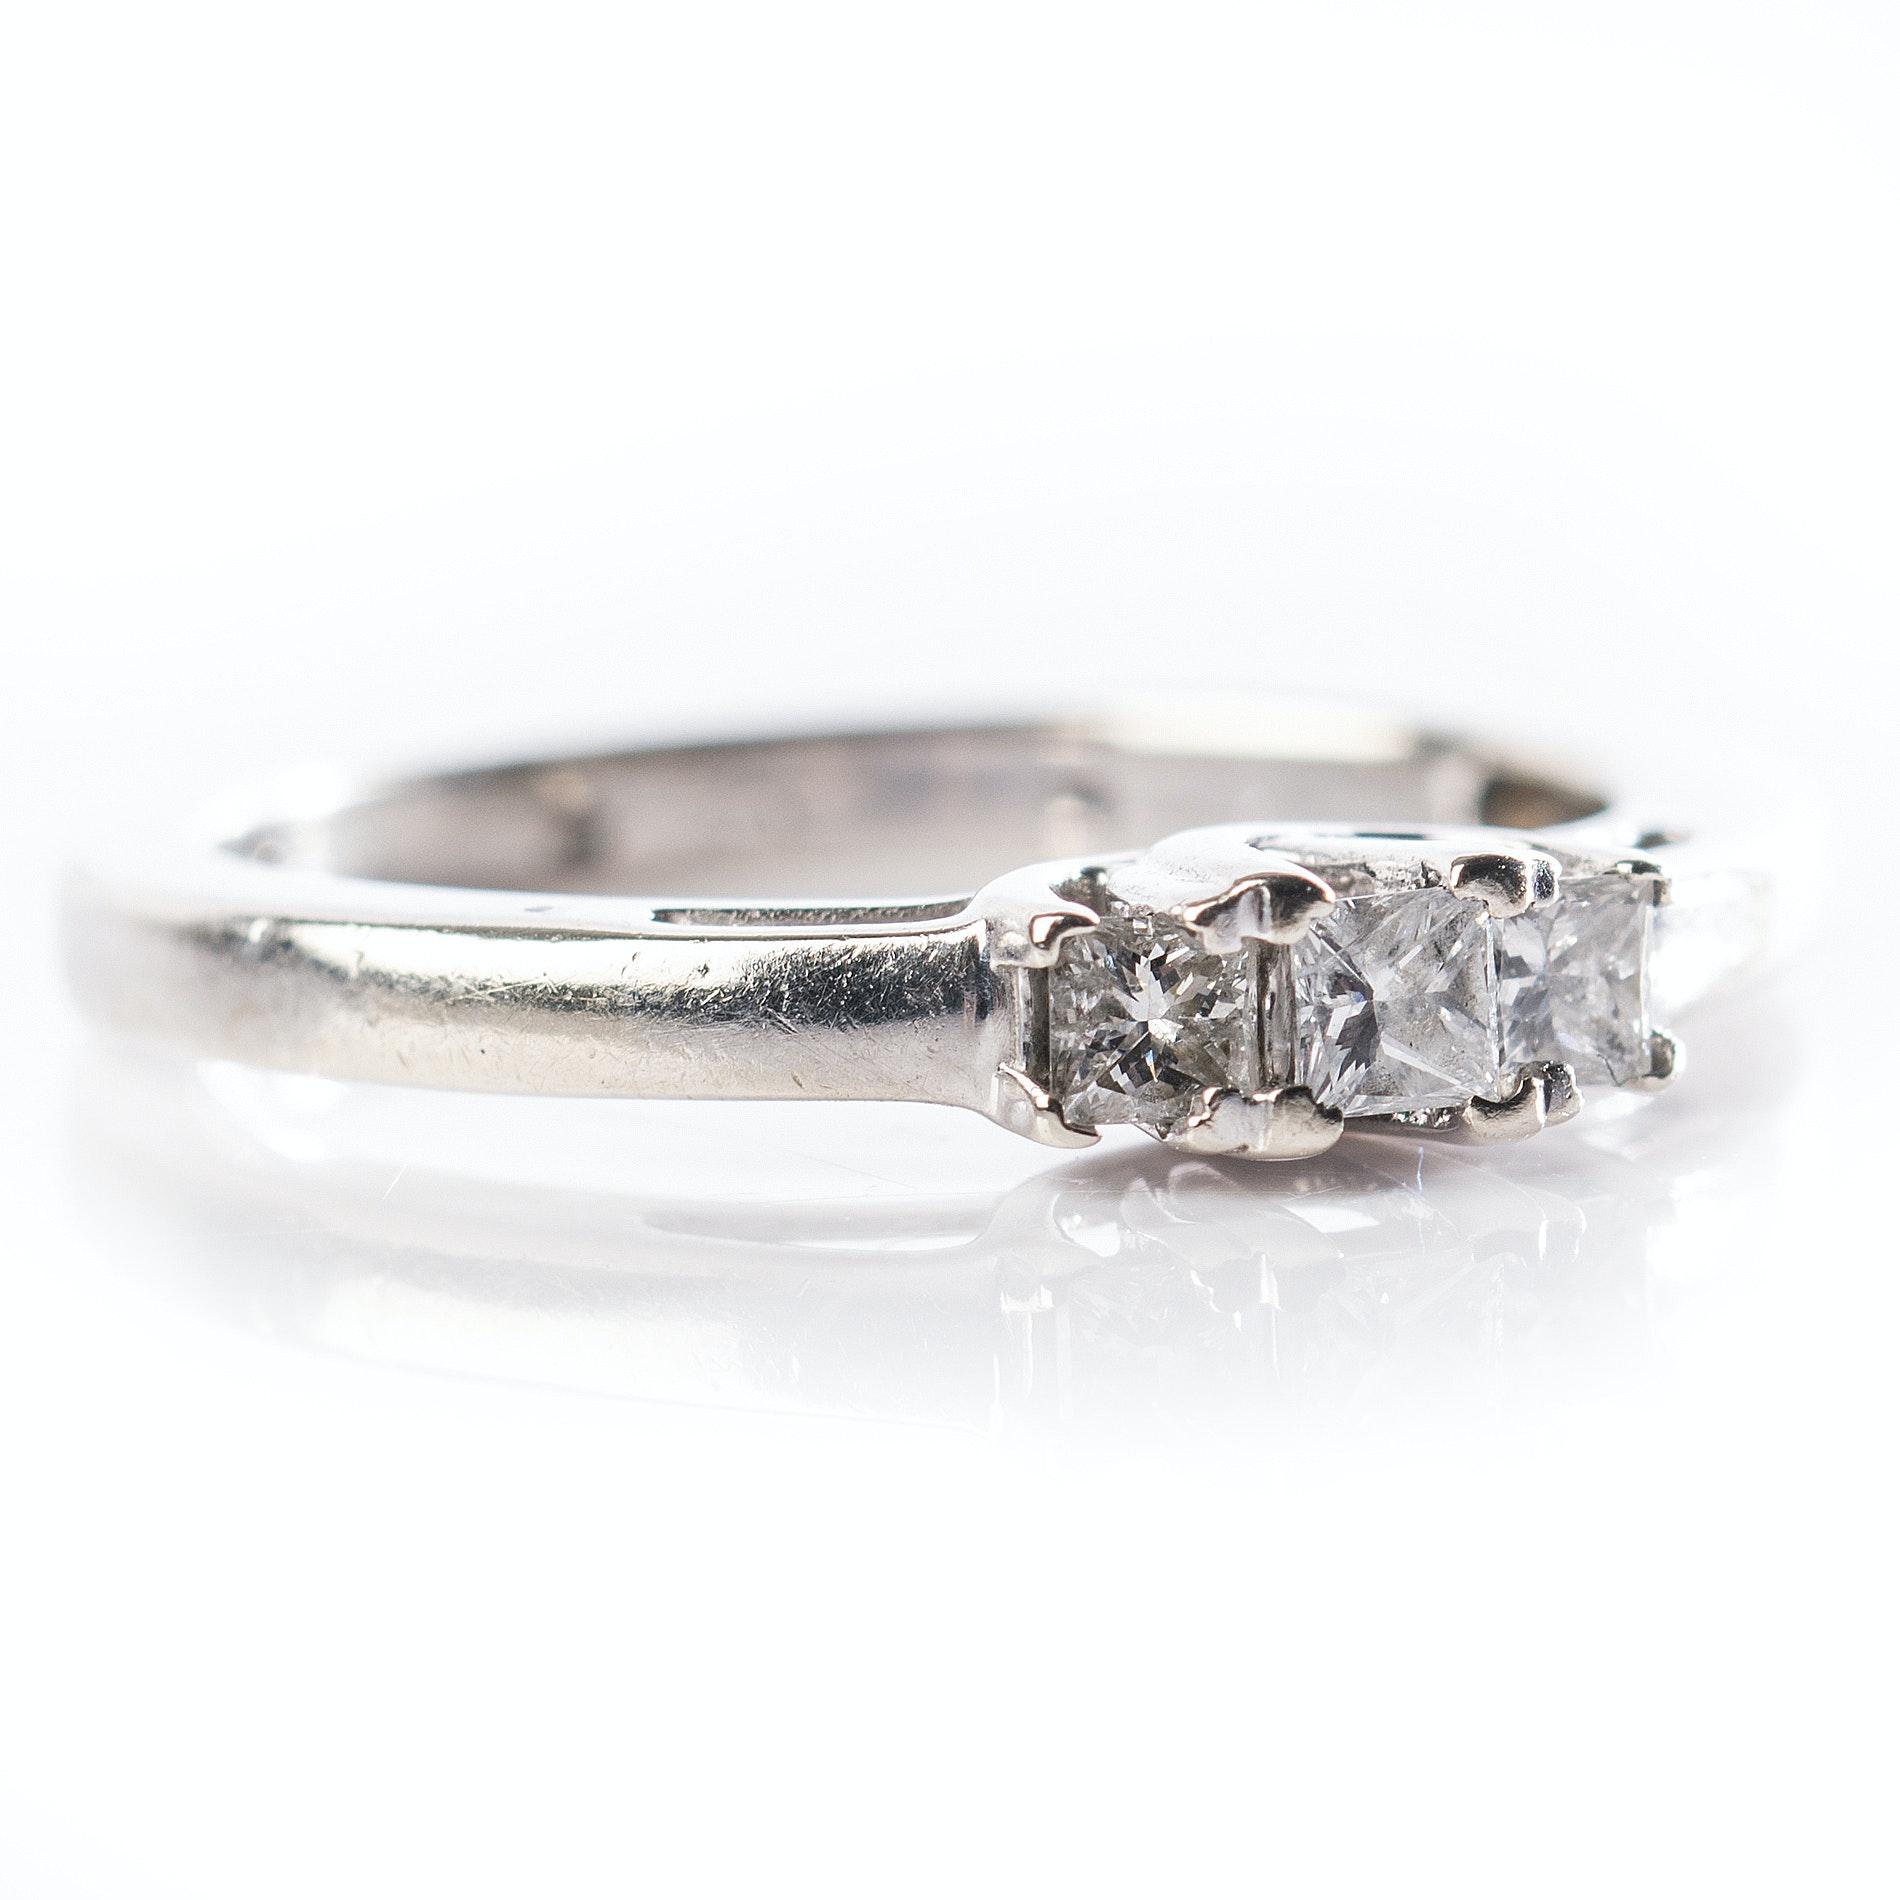 14K White Gold Three Stone Princess Cut Diamond Ring